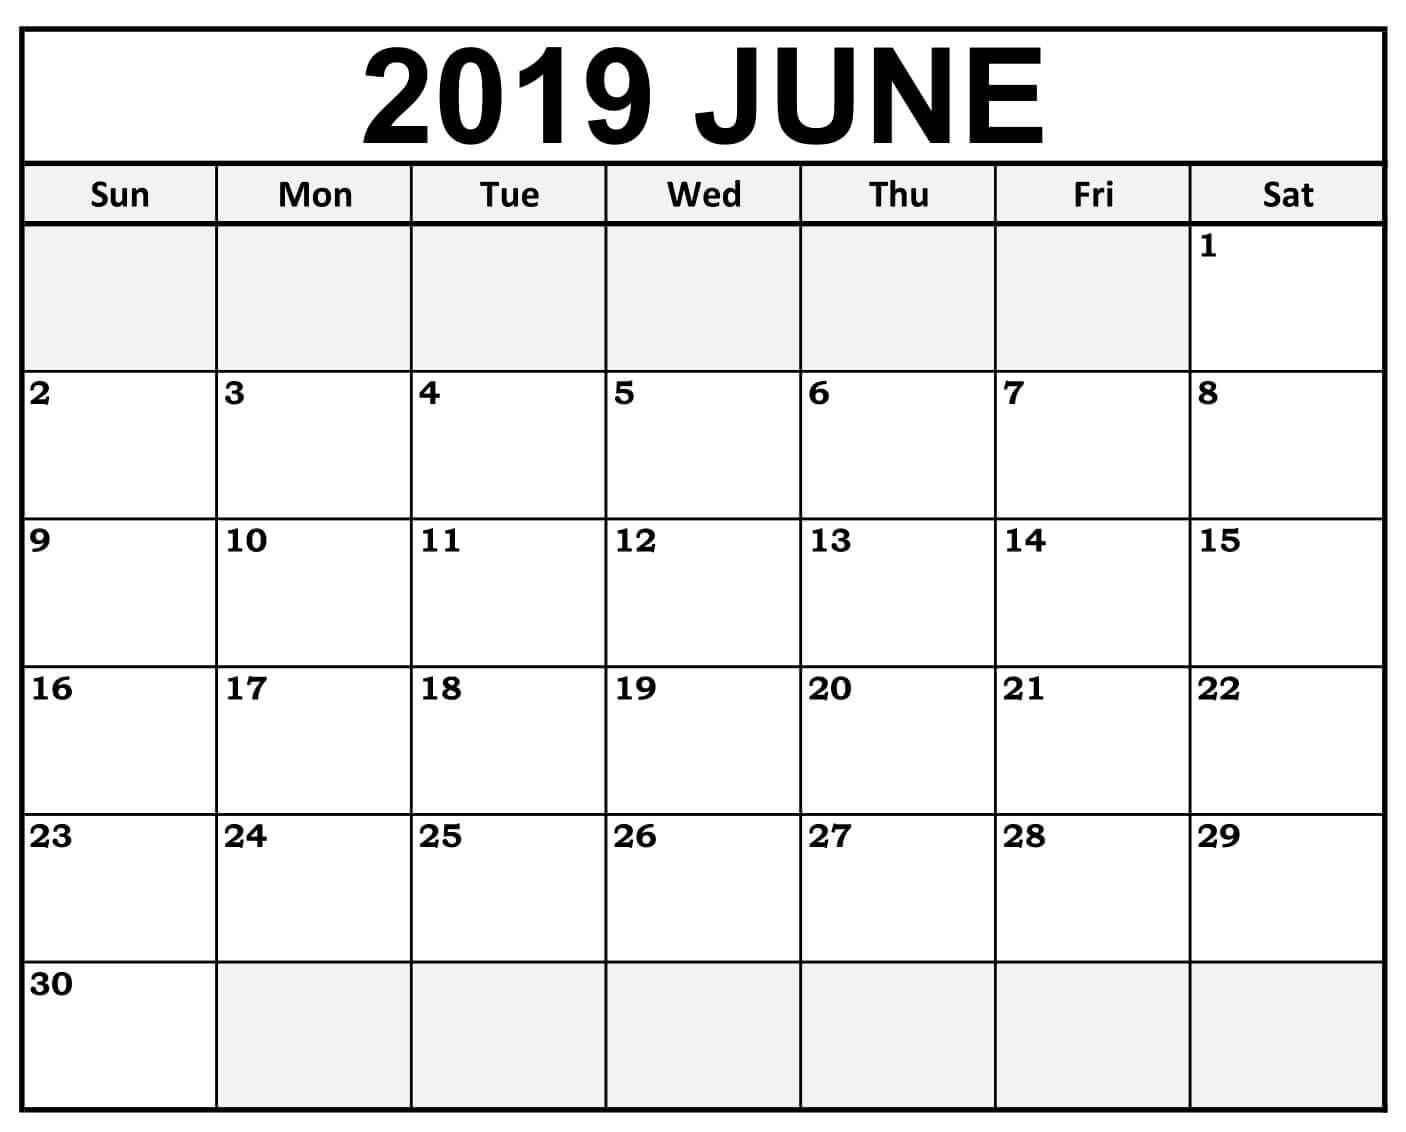 June 2019 Calendar Desk | September Calendar, Free Printable